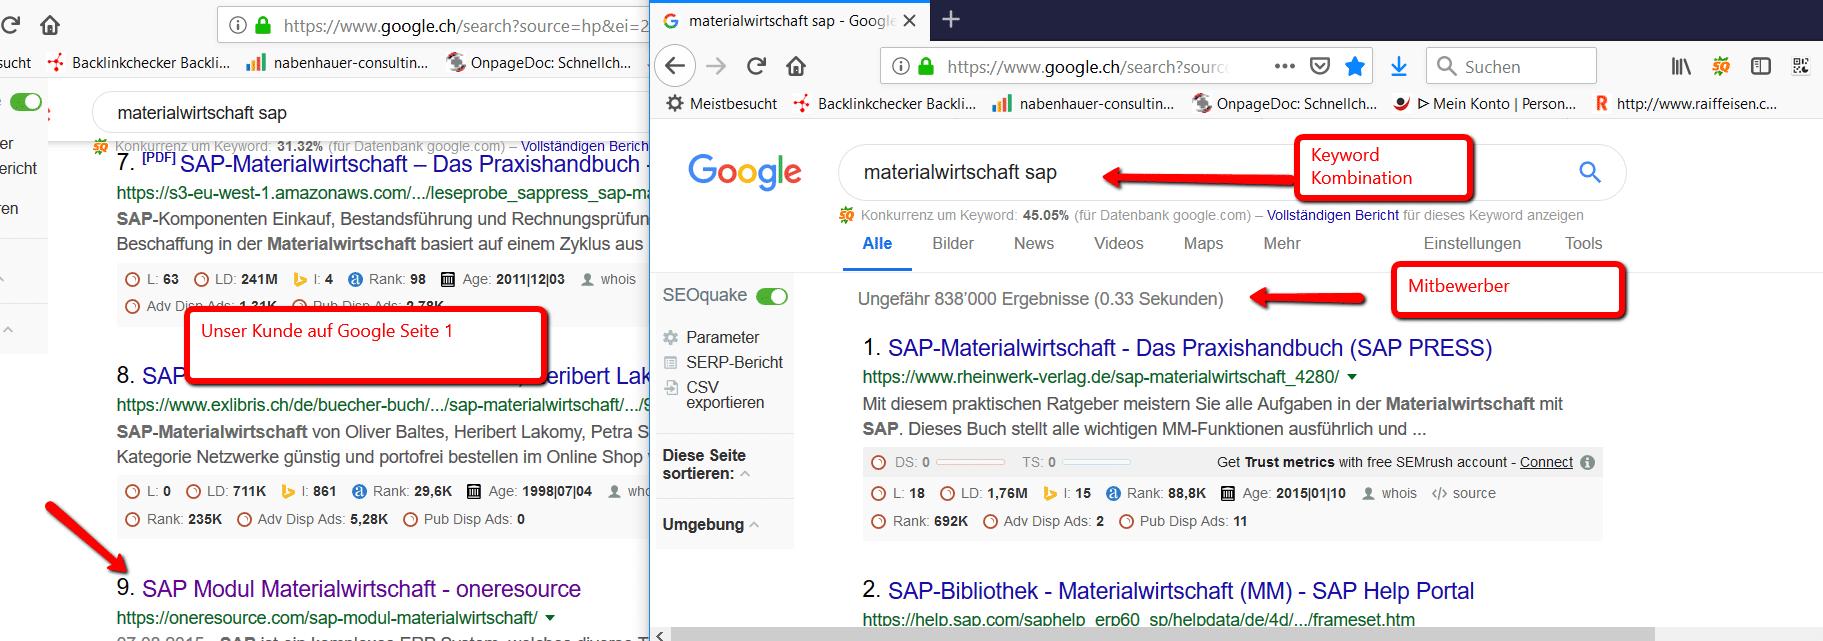 keyword_materialwirtschaft_sap